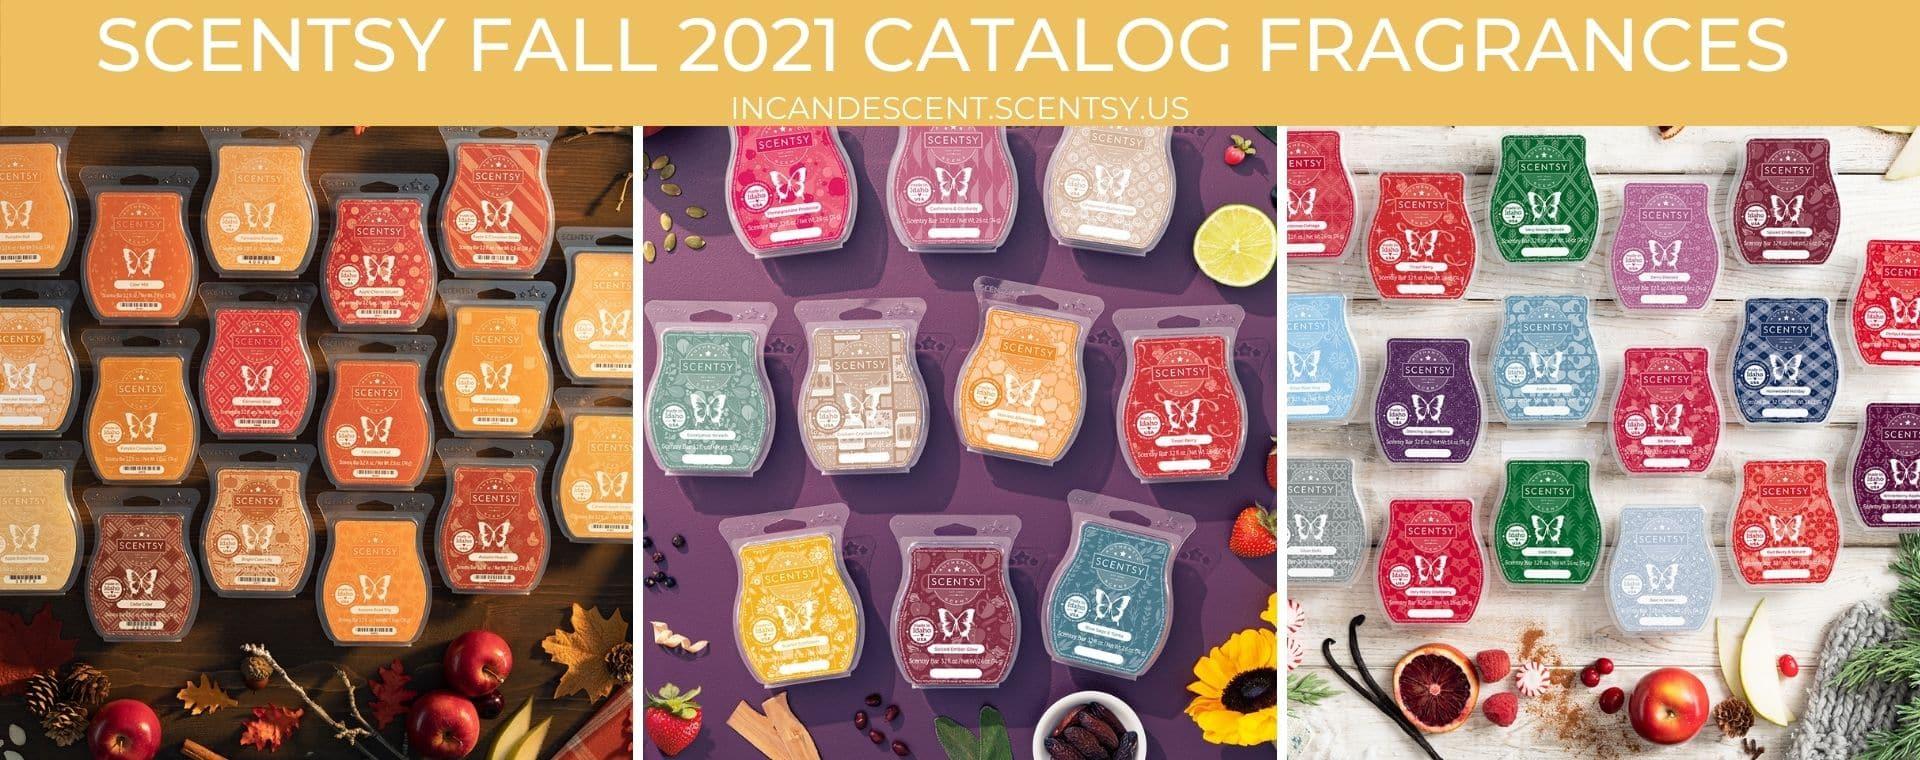 SCENTSY FALL 2021 CATALOG FRAGRANCES   Scentsy Fall 2021 Catalog Scent List